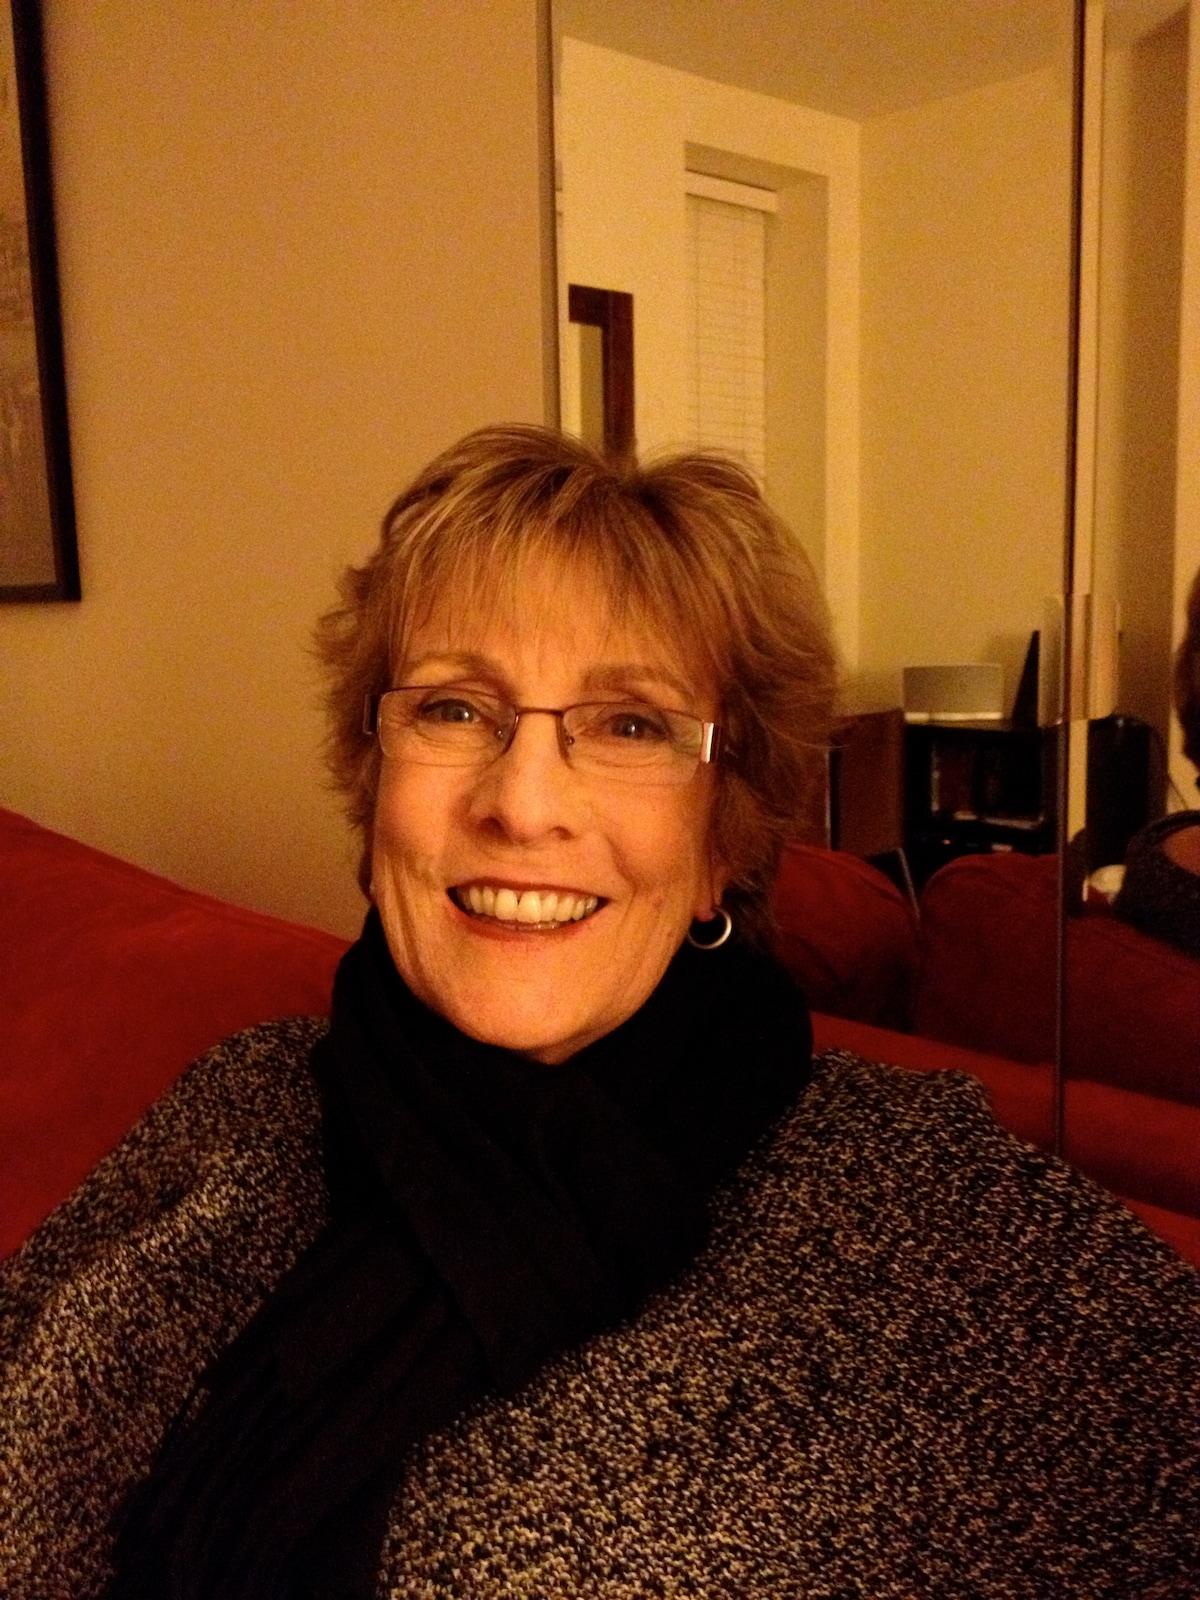 Linda from San Luis Obispo